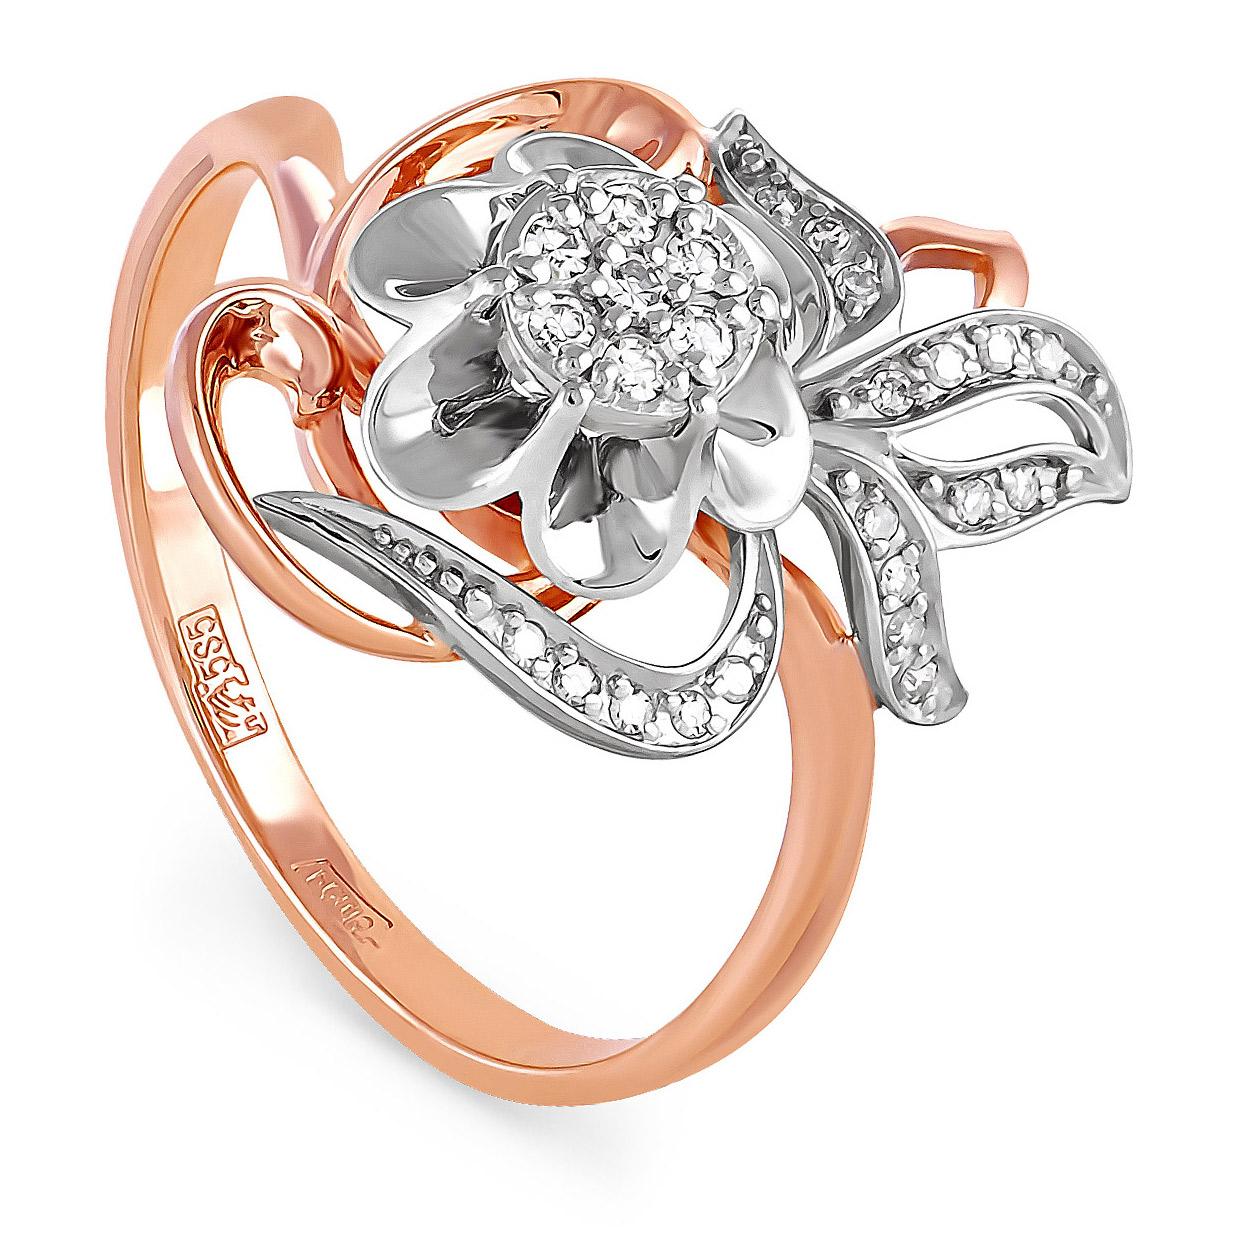 Золотое кольцо Бриллиант арт. 11-0357-1000 11-0357-1000